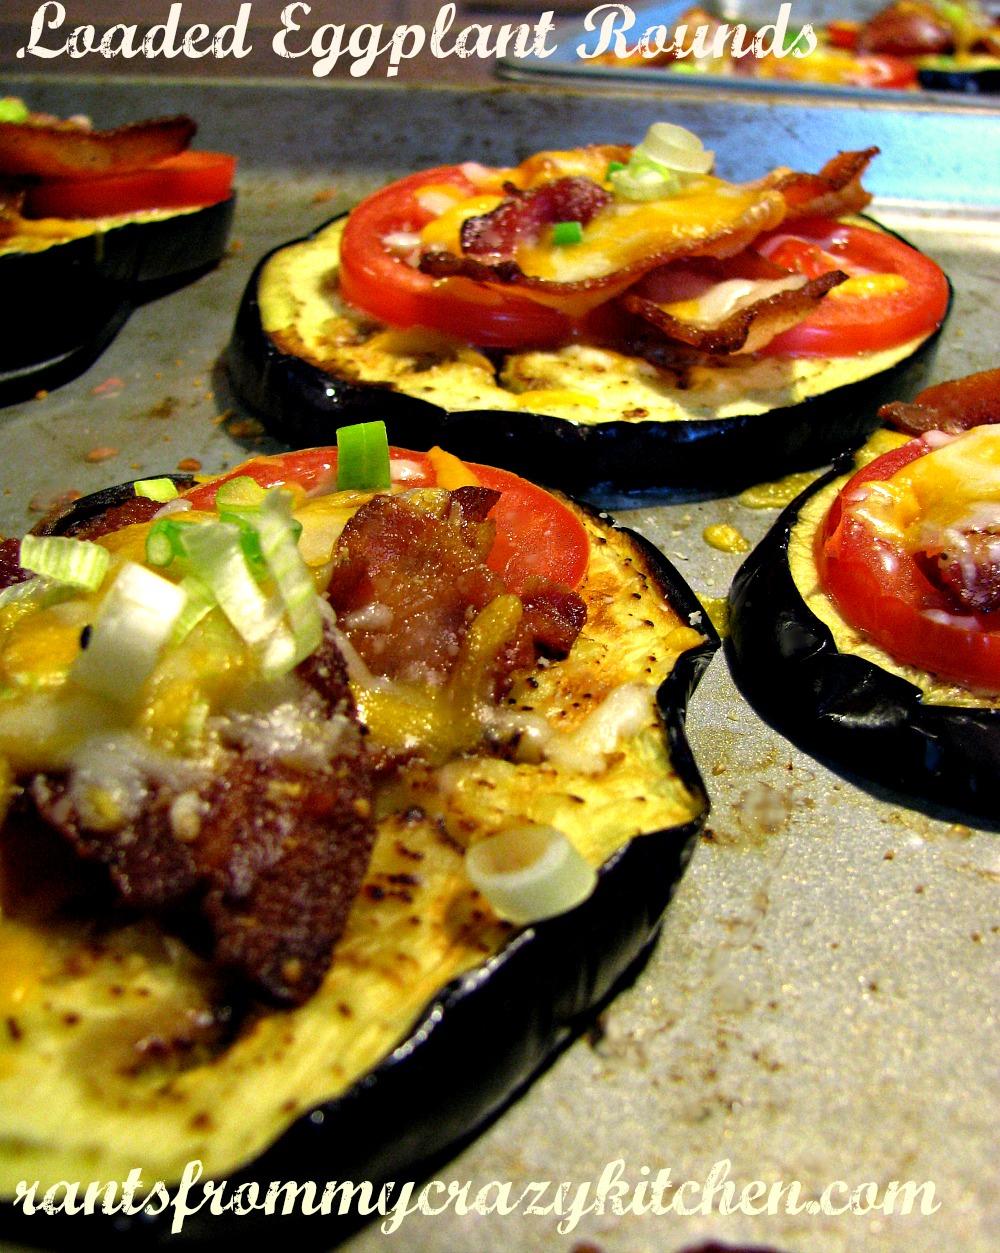 Loaded-Eggplant-Rounds-Closeup